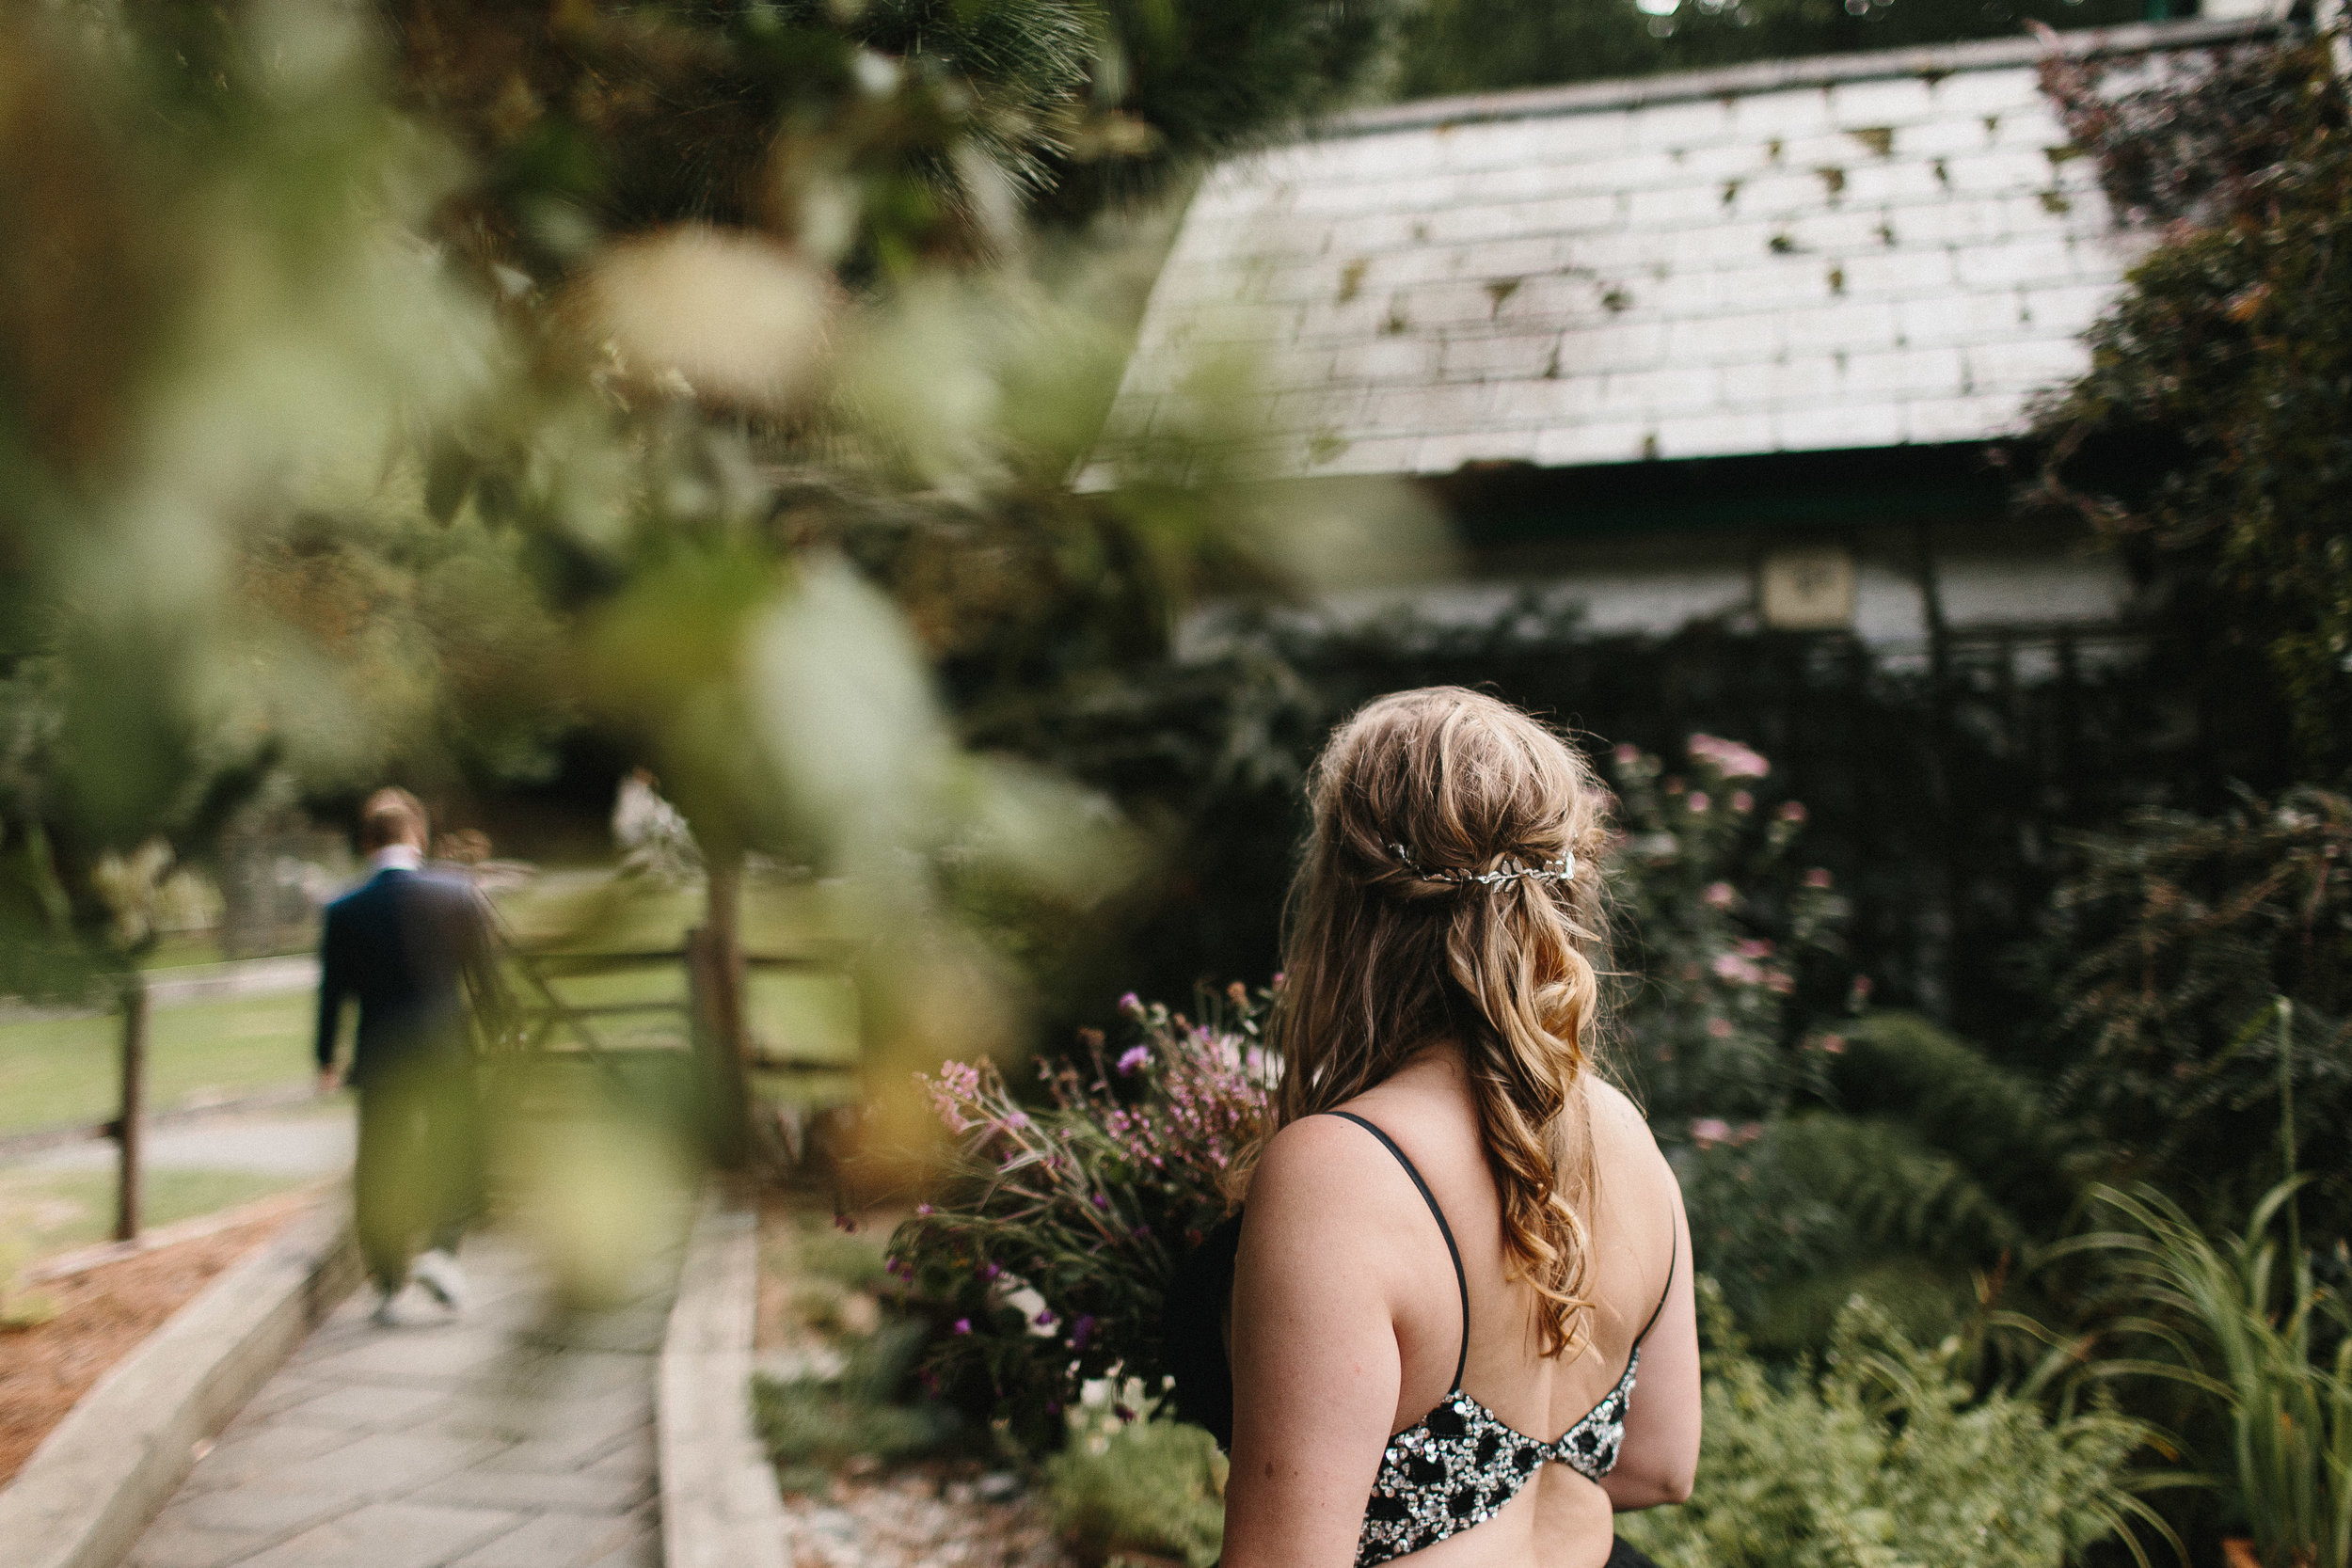 ireland_elopement_black_wedding_dress_wicklow_glendalough_athy_st_kevins_way_1489.jpg